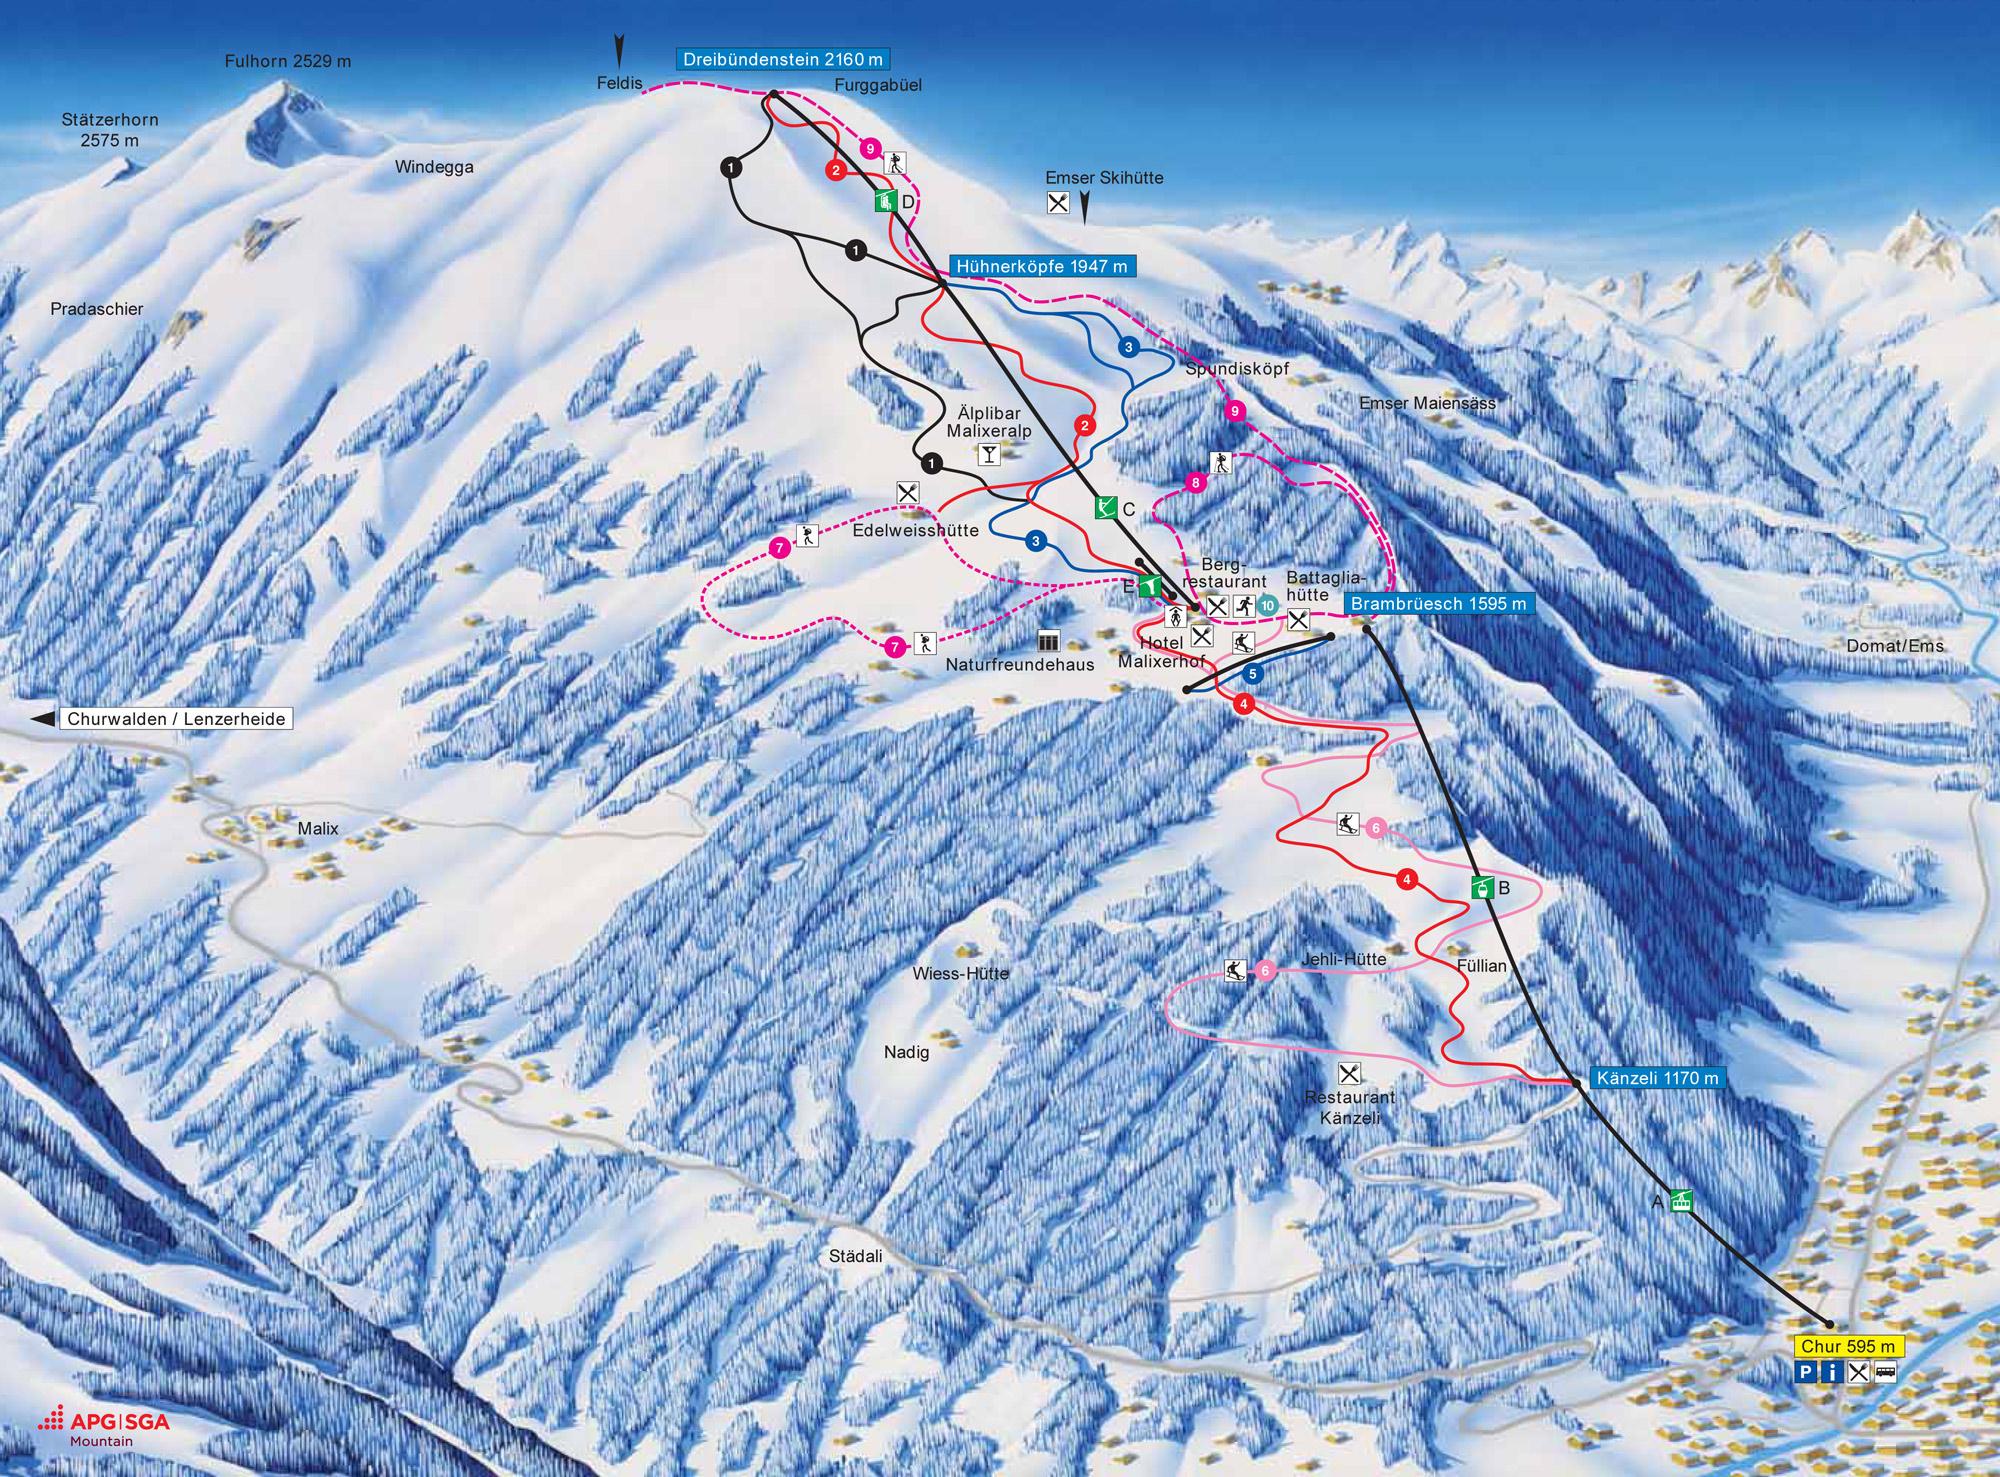 Chur Switzerland Tourism - Chur map